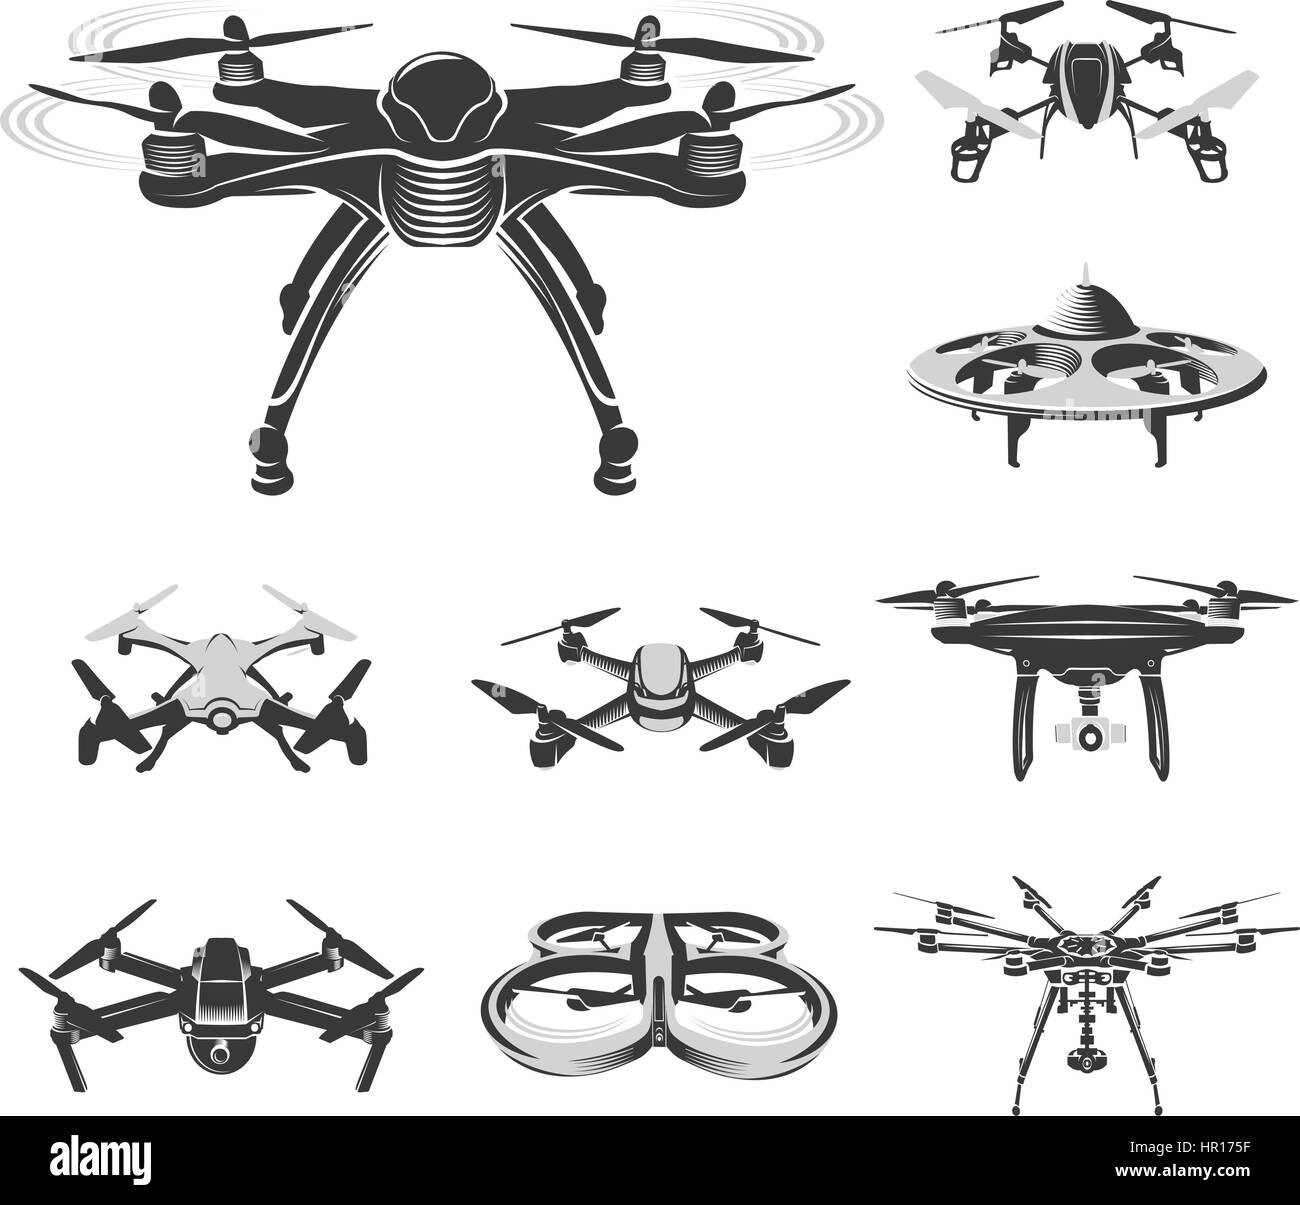 Acheter parrot drone quadcopter drone anafi